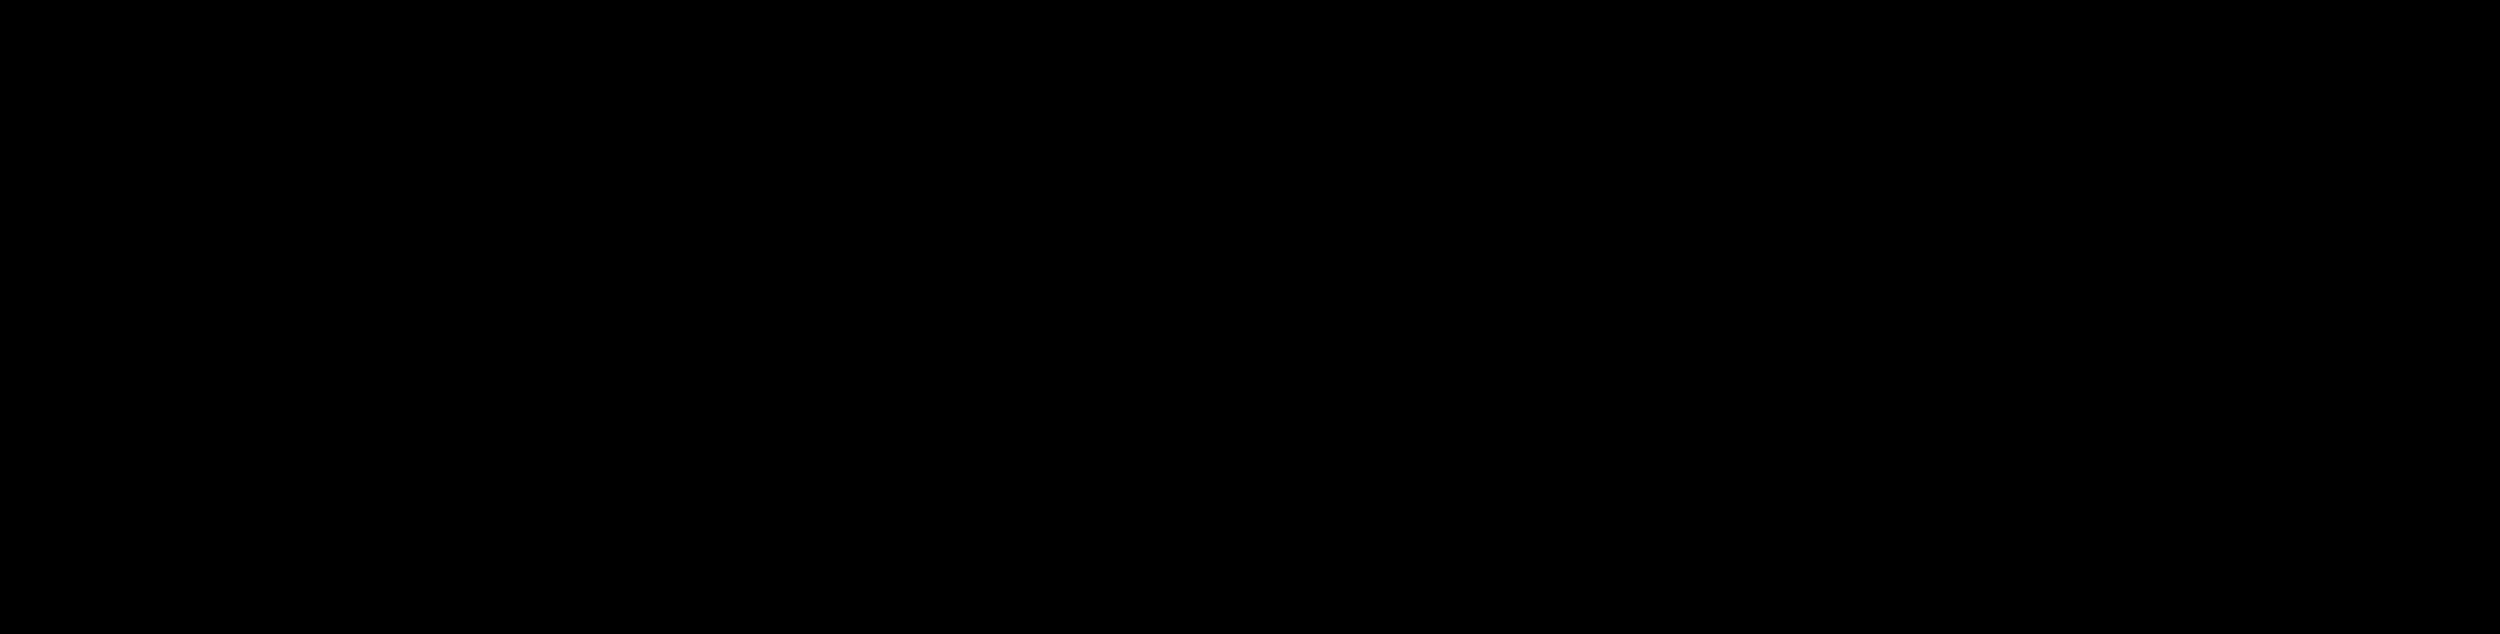 LeadYouth Branding FINAL-Black.png